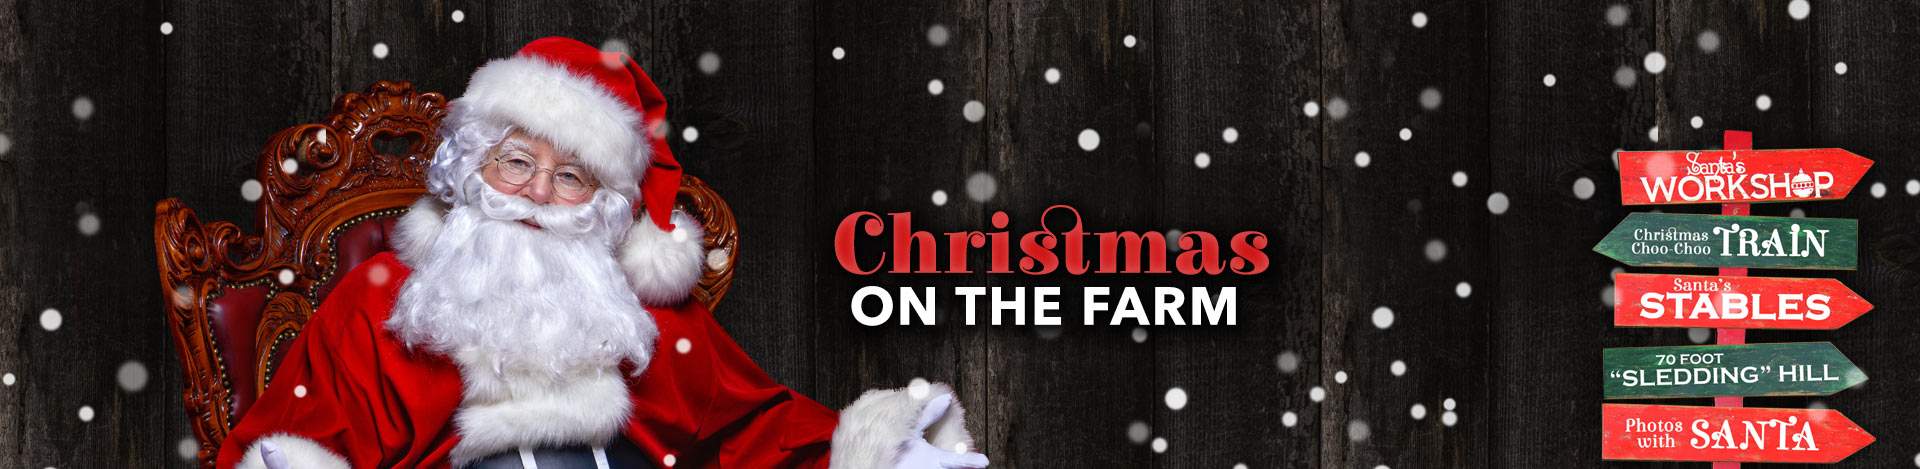 Christmas on the Farm - Santa & Family Friendly Activities